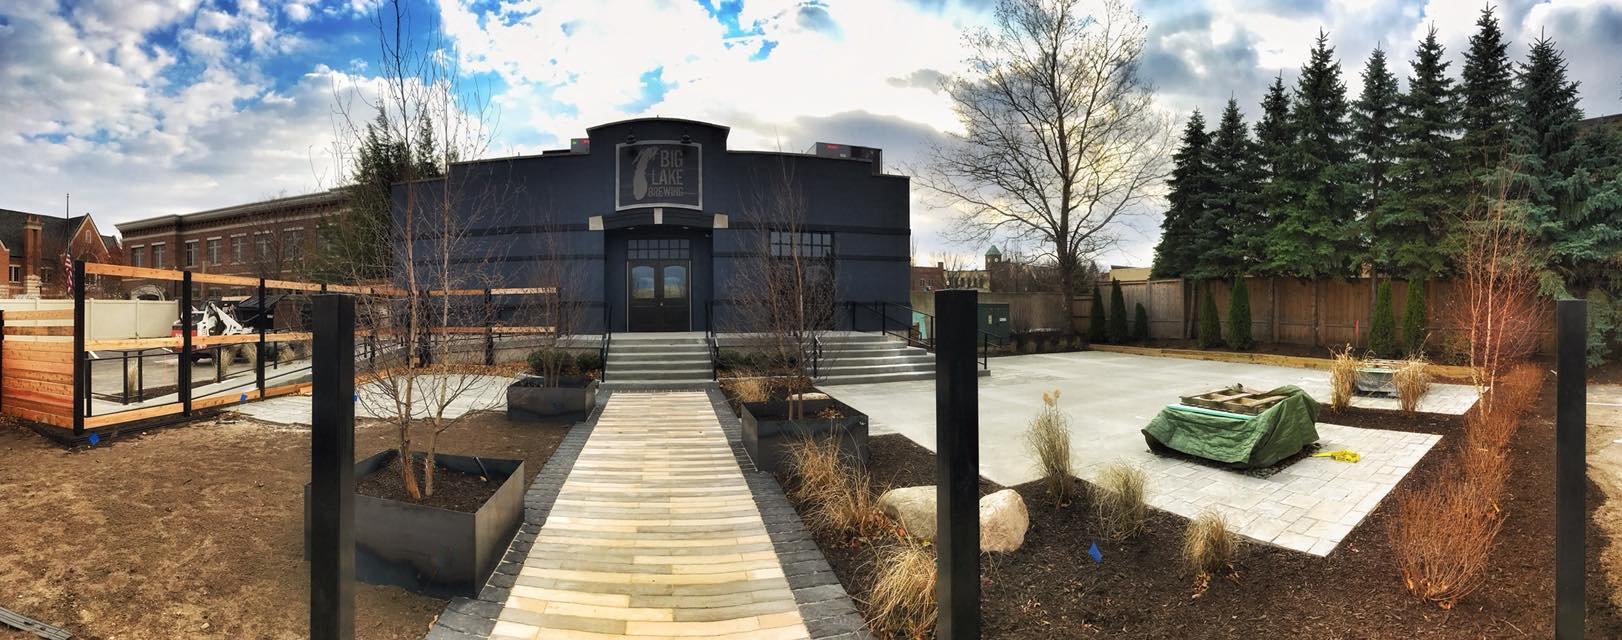 Big Lake Brewing | DIVE IN